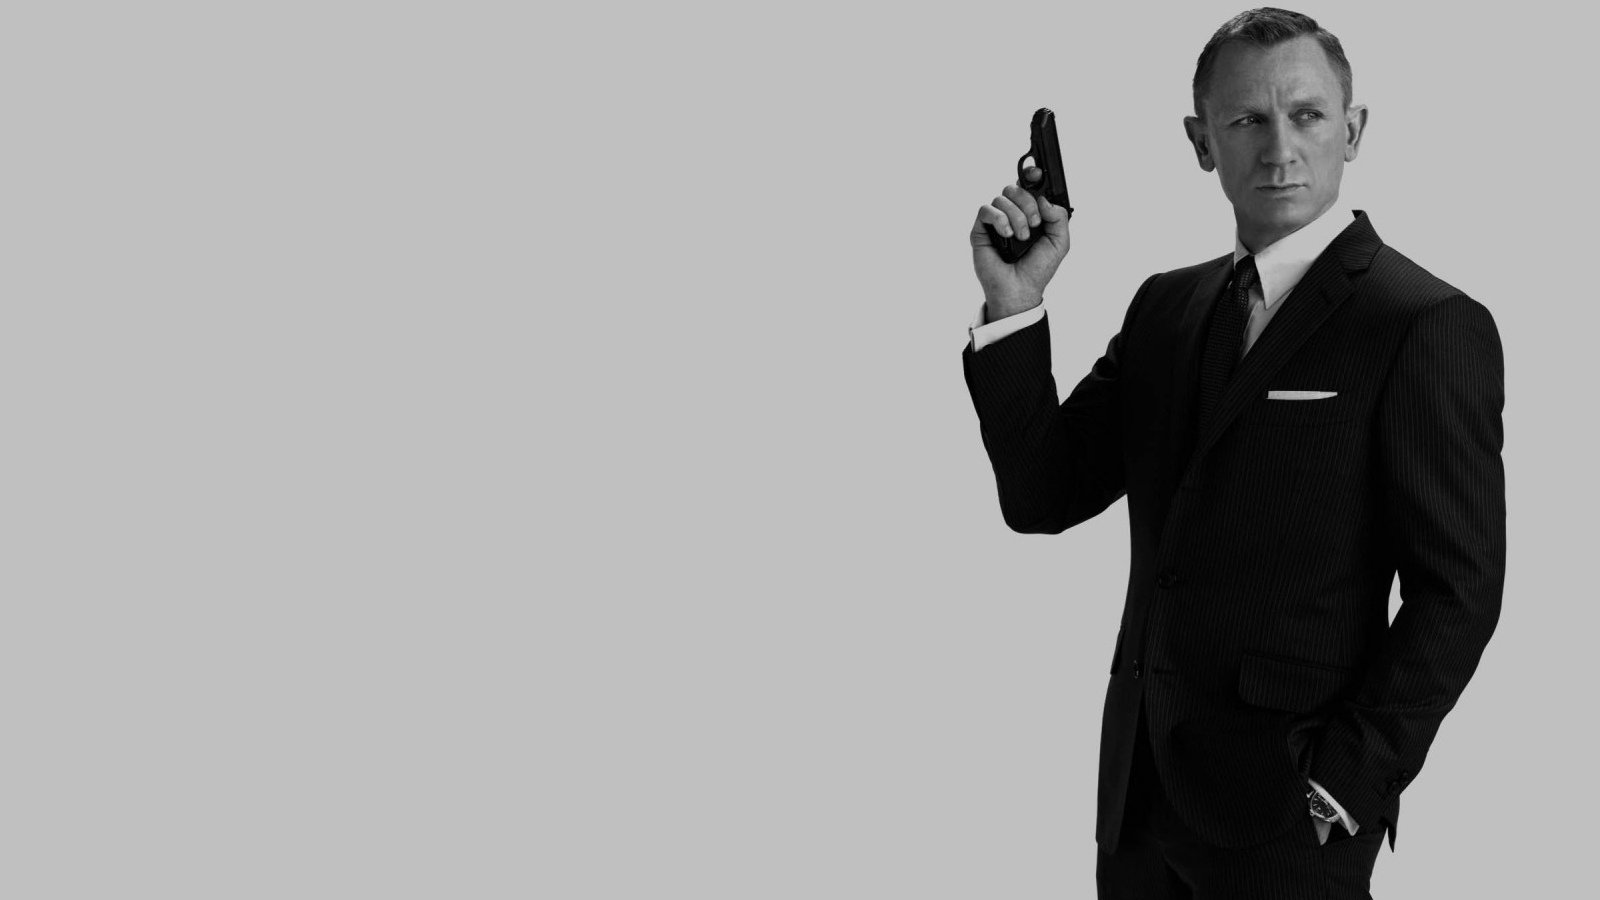 fond d'ecran gratuit 007